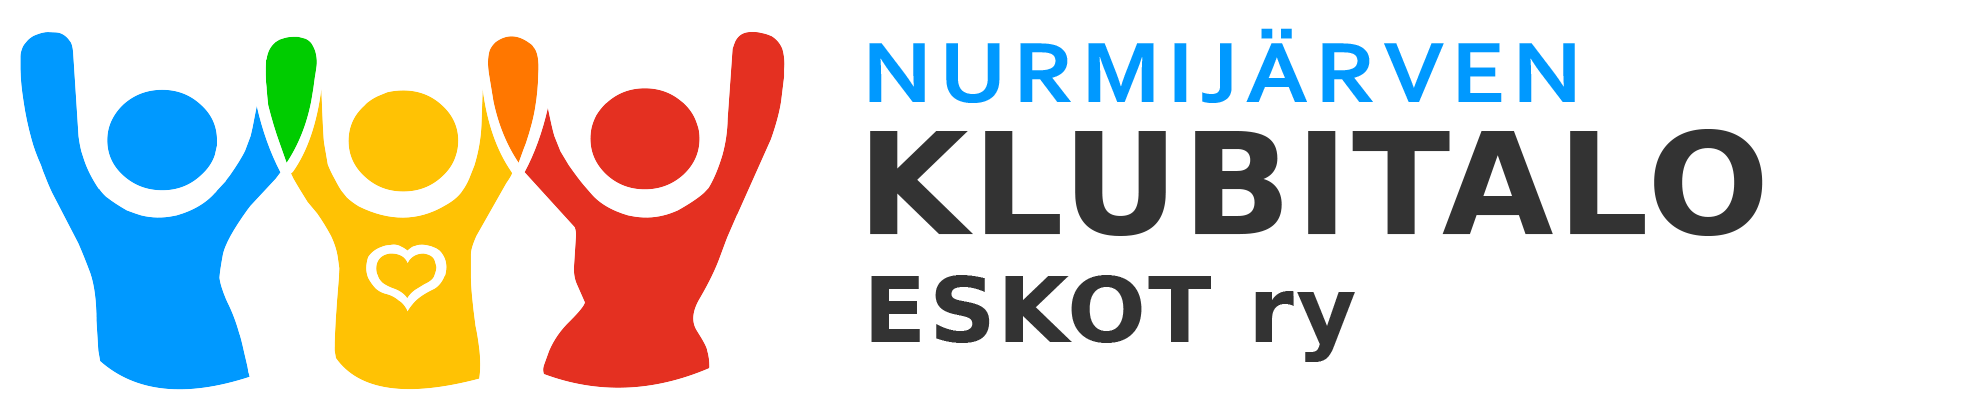 Nurmijärven Klubitalo Logo